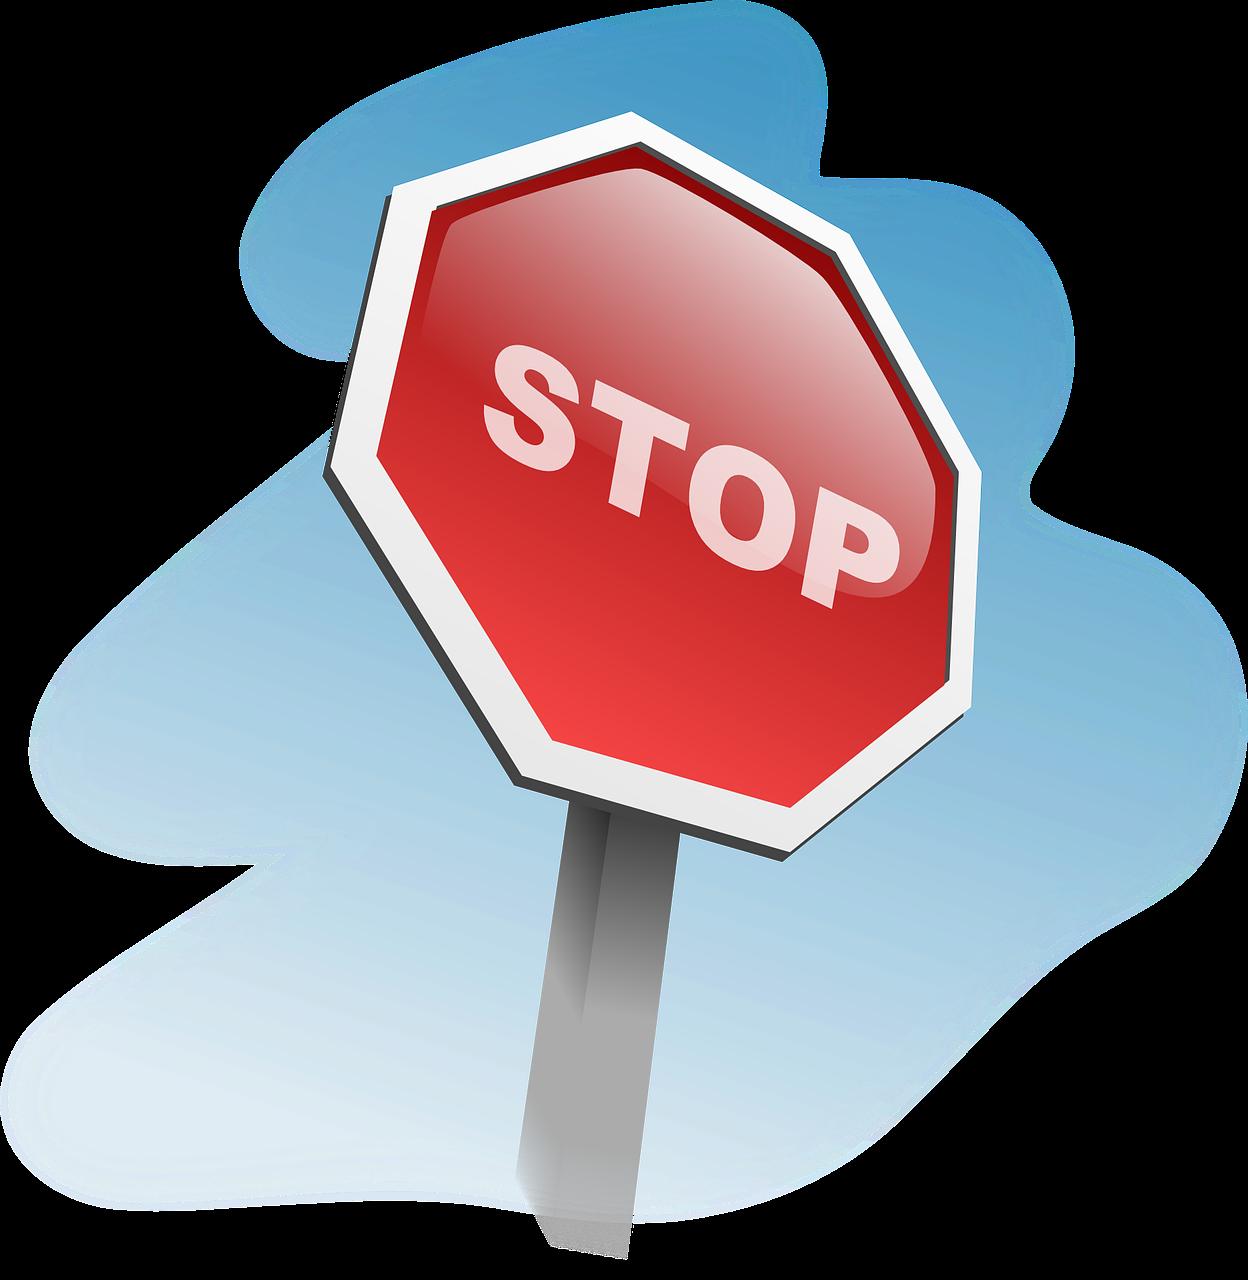 stop, znak, prawko